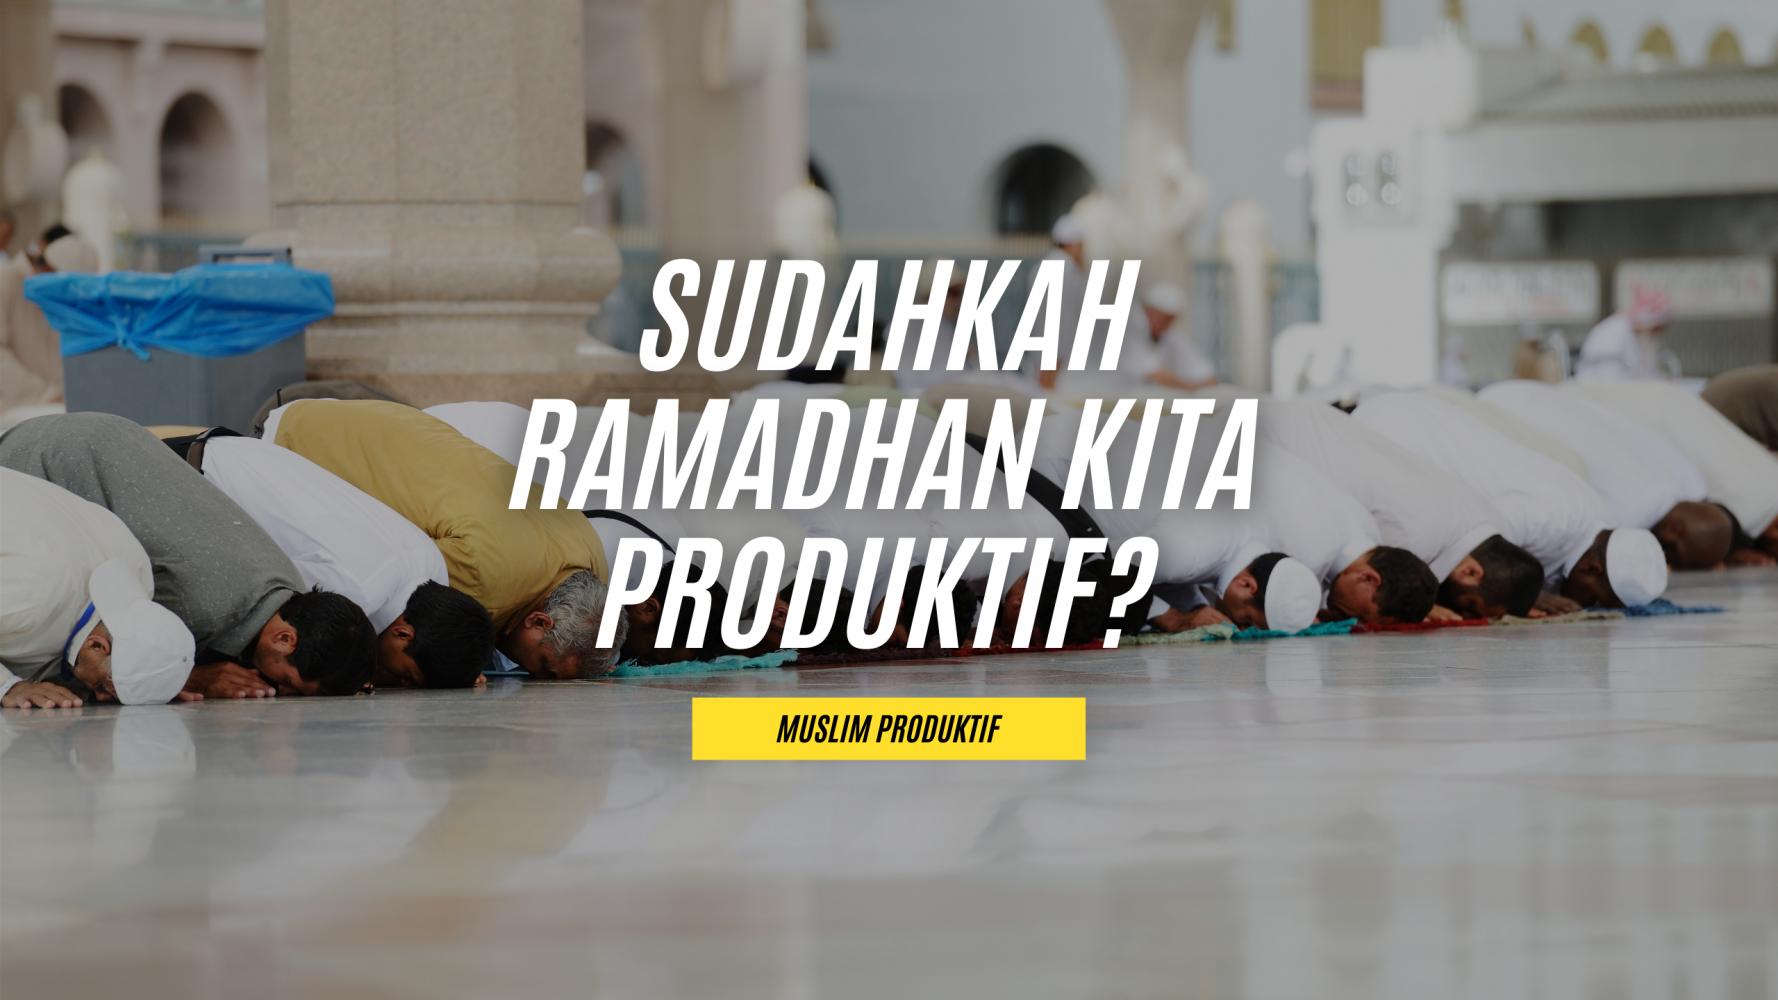 Sudahkah Ramadhan Kita Produktif?